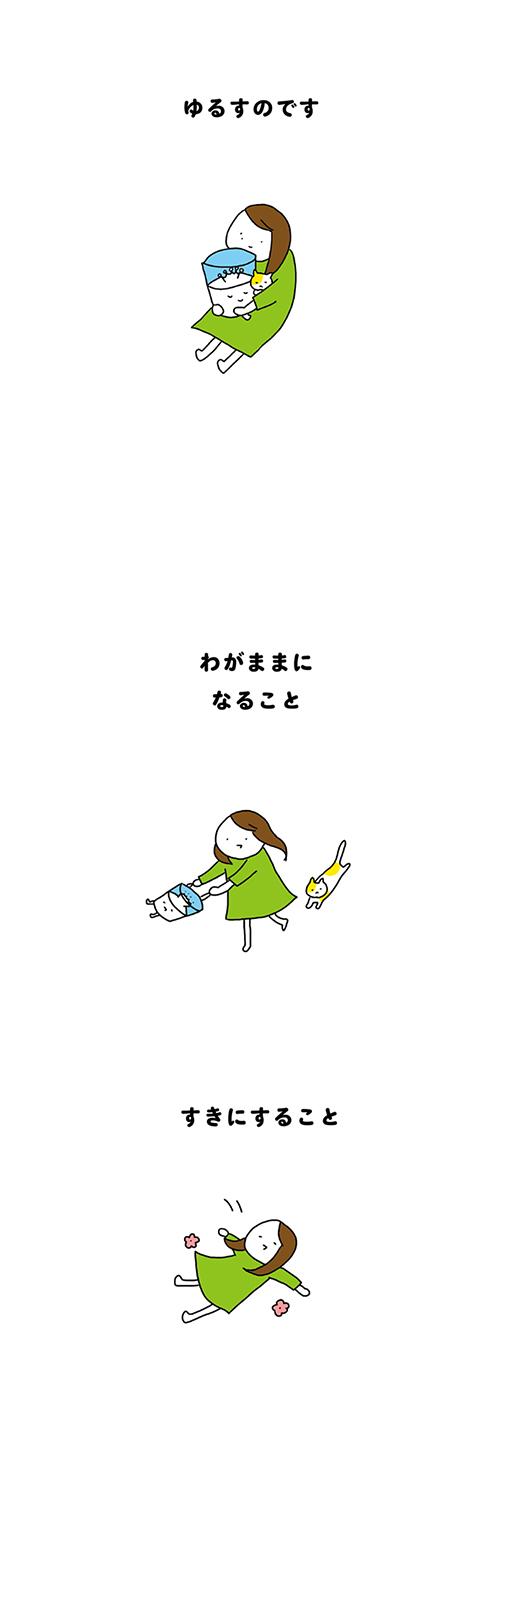 kotaete_180613_03